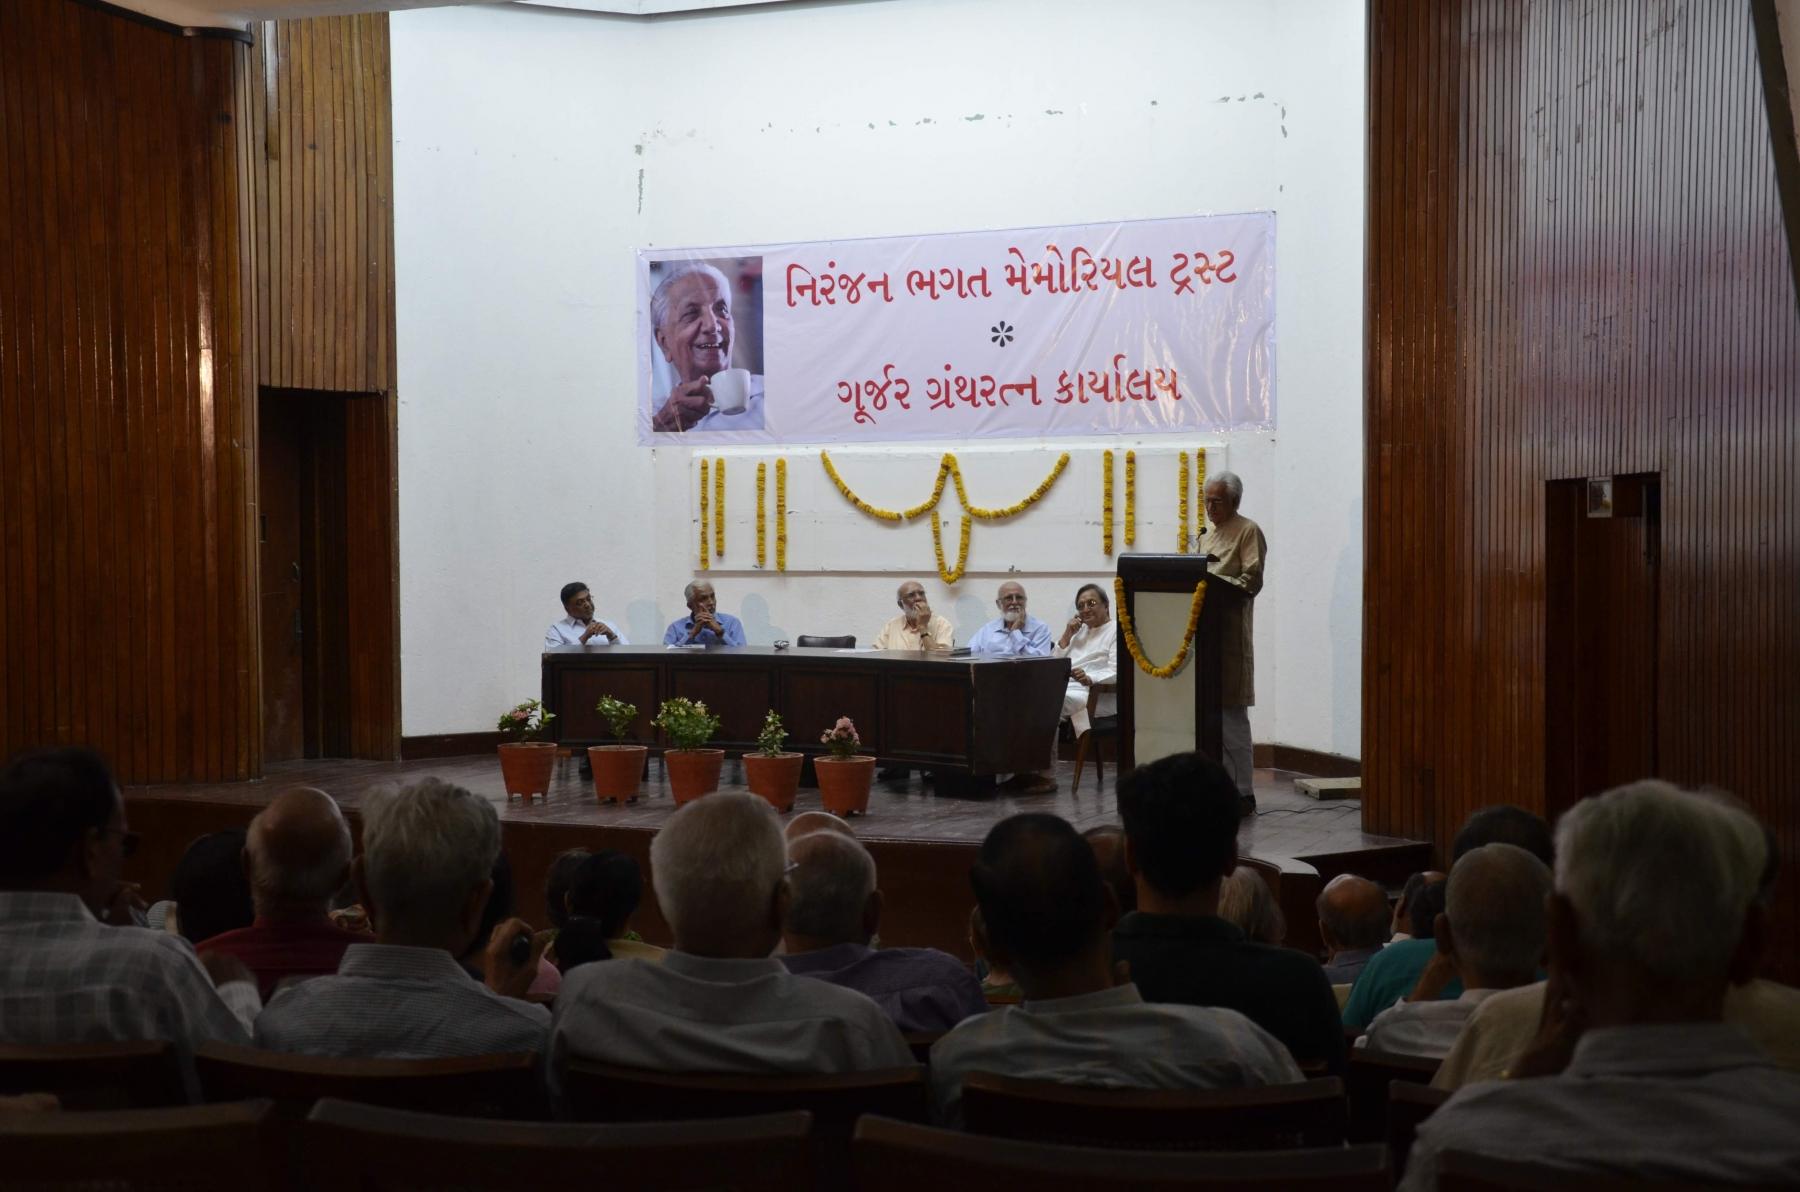 Shri Raghuvir Chaudhary's talk at the event